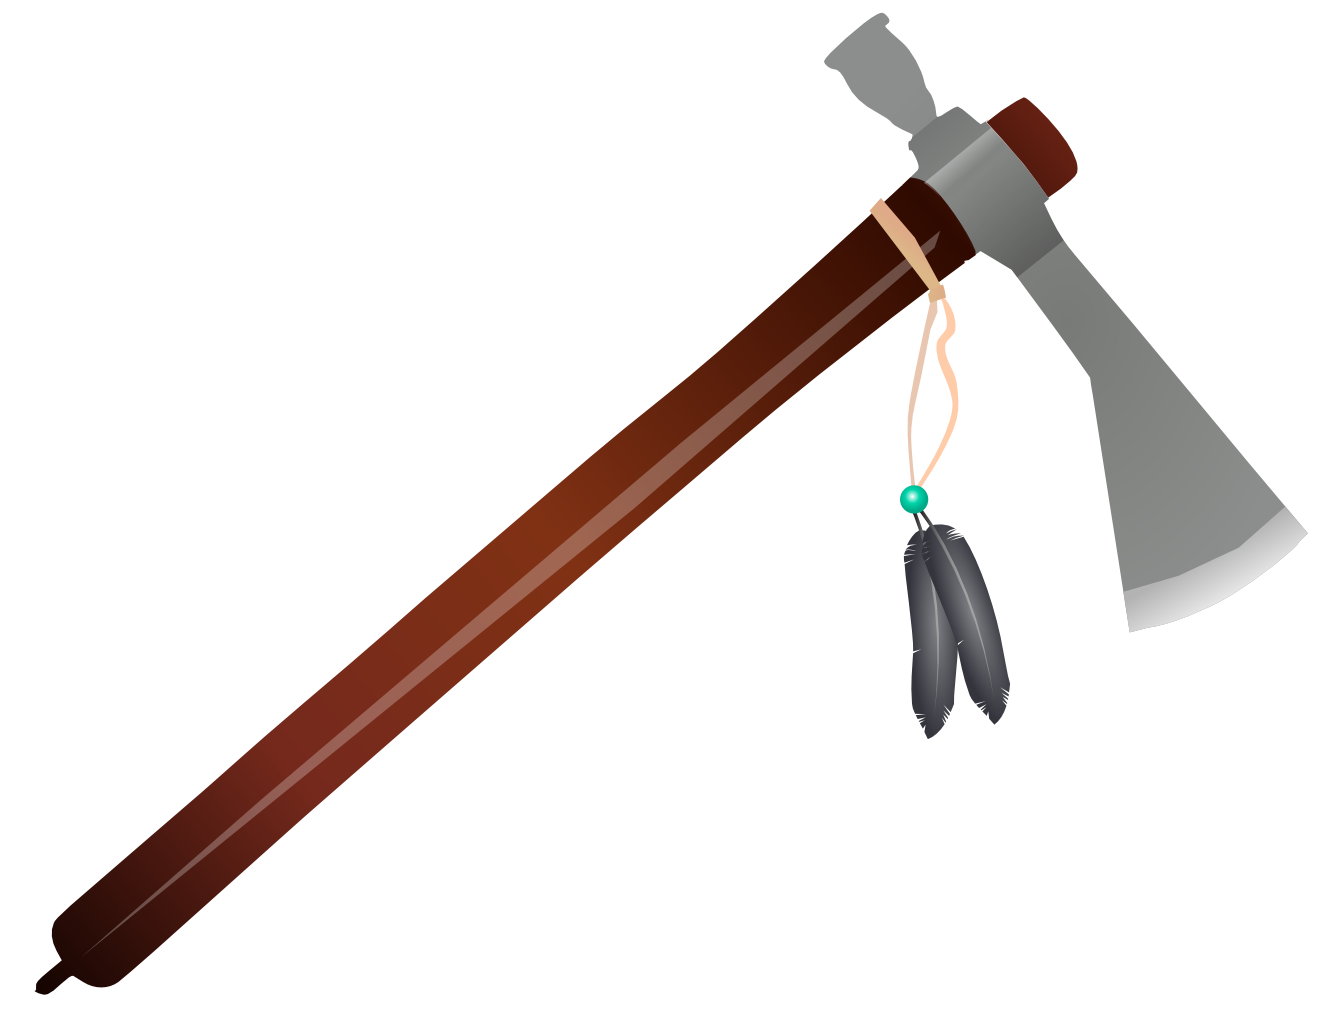 Tomahawk Clipart-tomahawk clipart-4